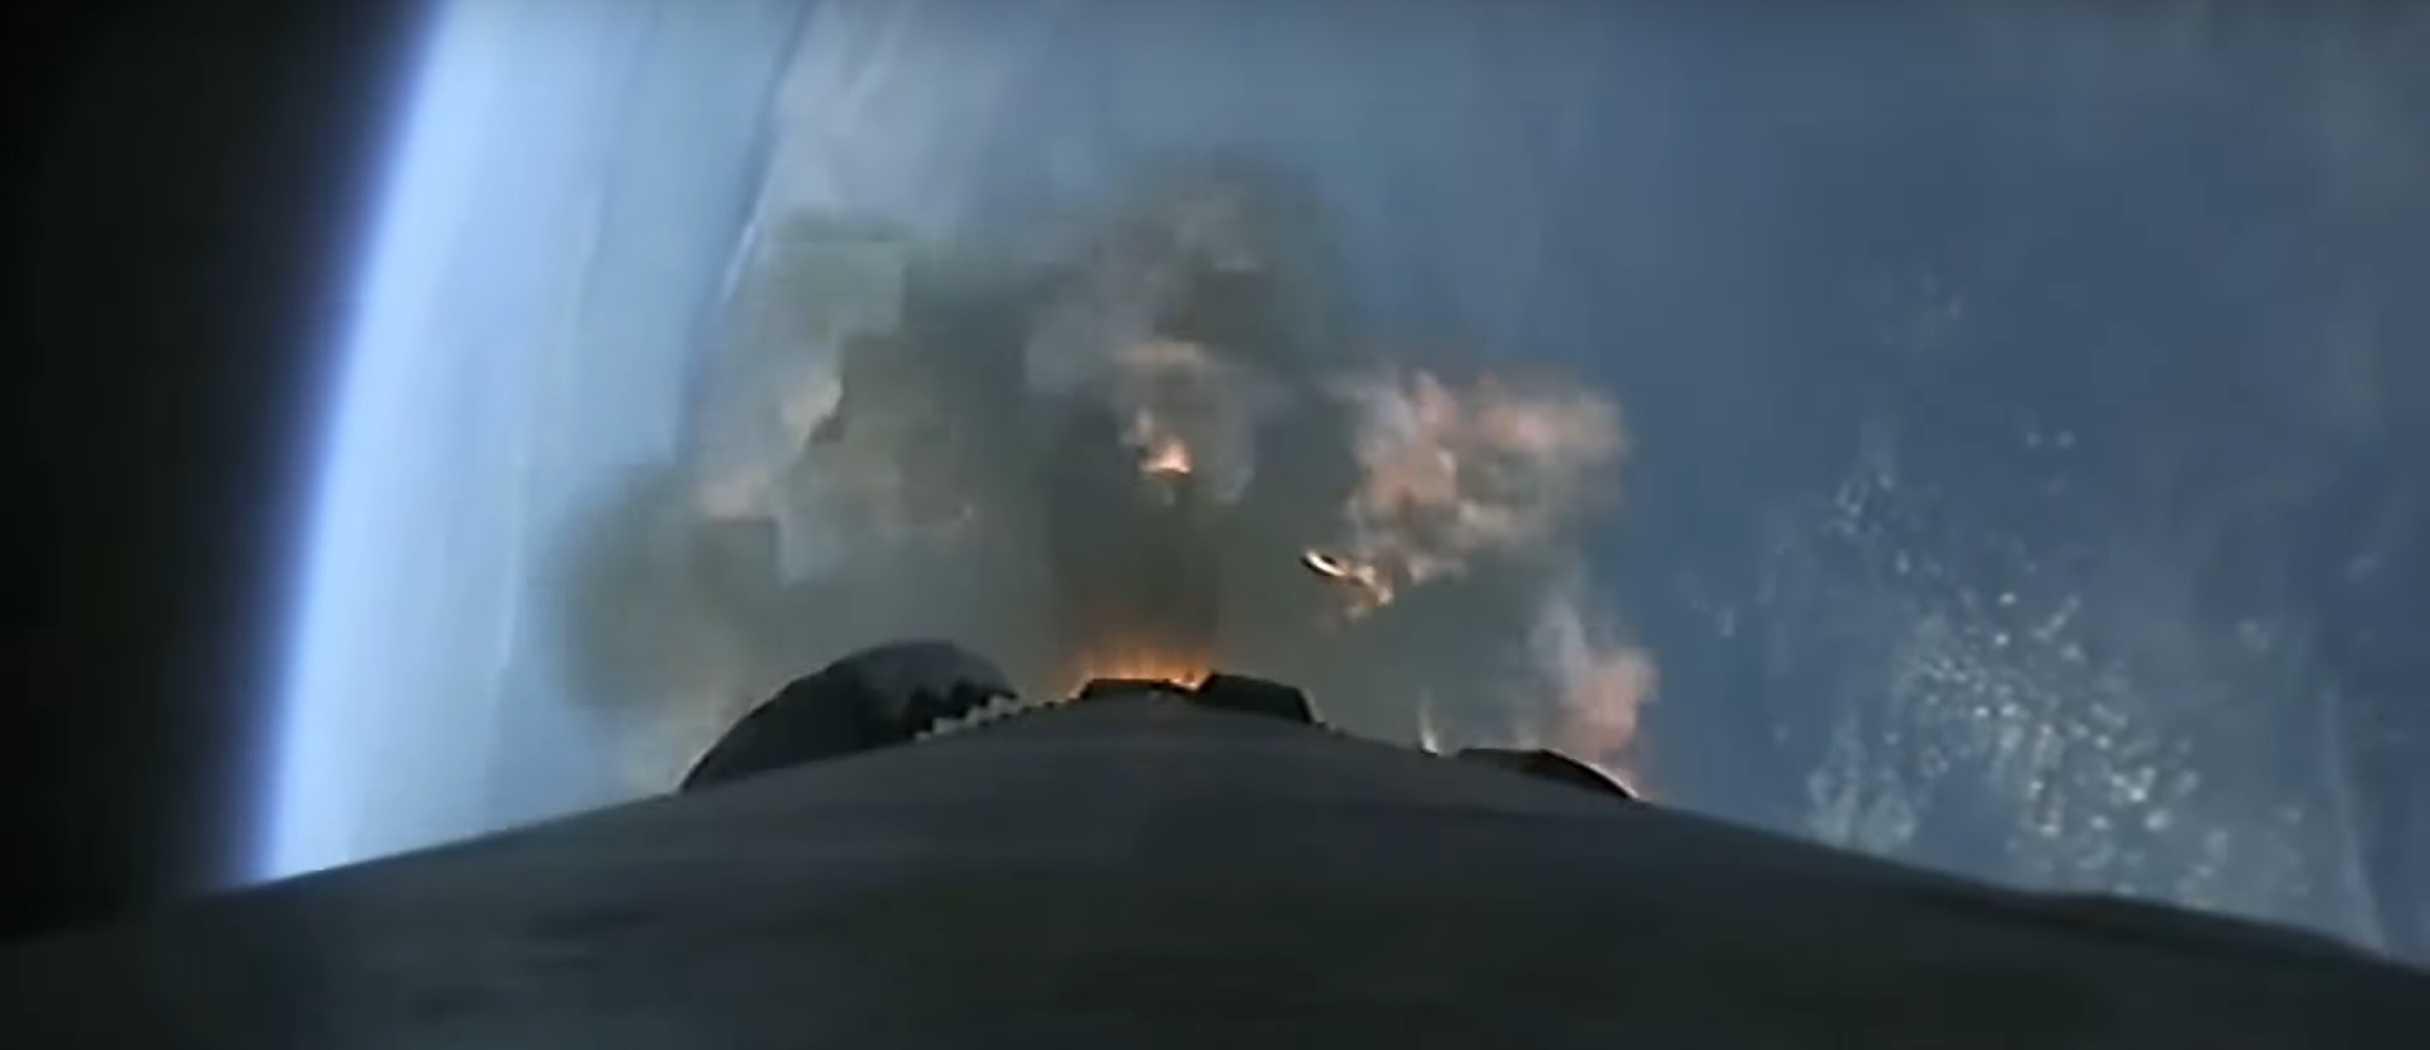 Starlink V1 L5 webcast 031820 (SpaceX) B1048 engine failure 1